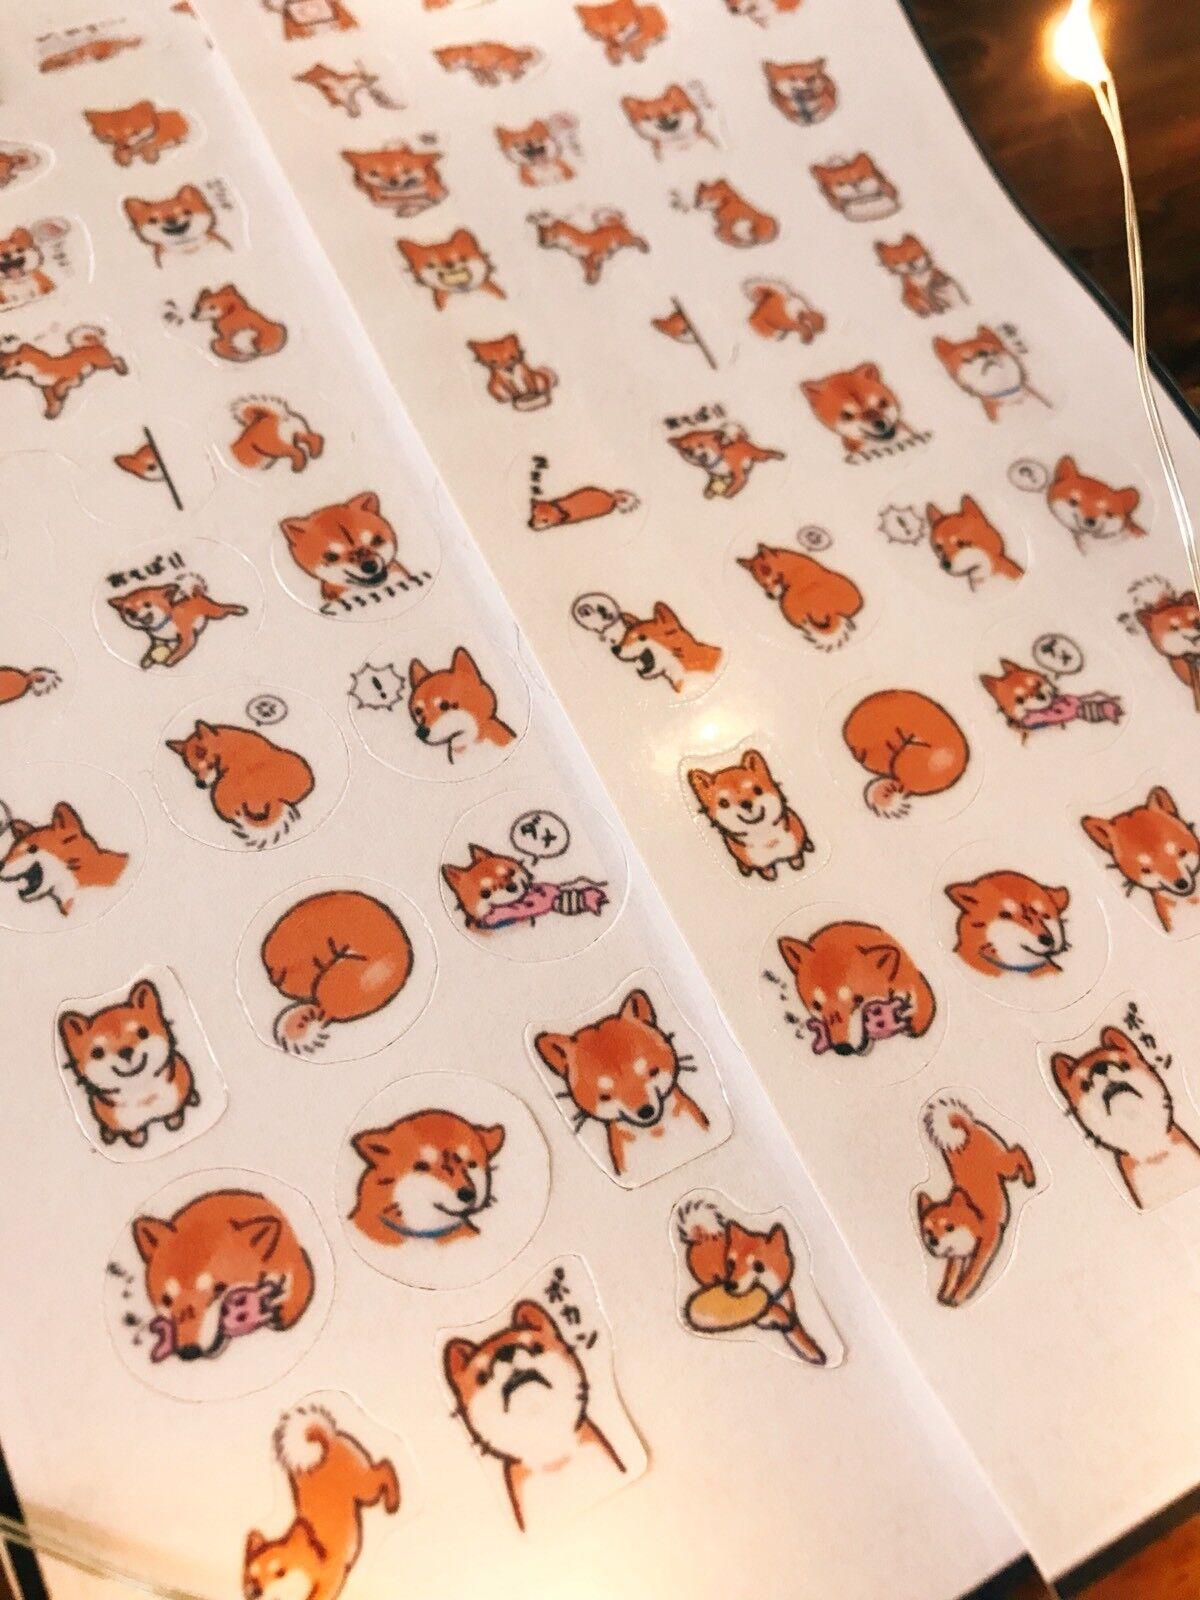 2* Shiba Inu stickers! Kawaii Japanese dog emoticon faces, c